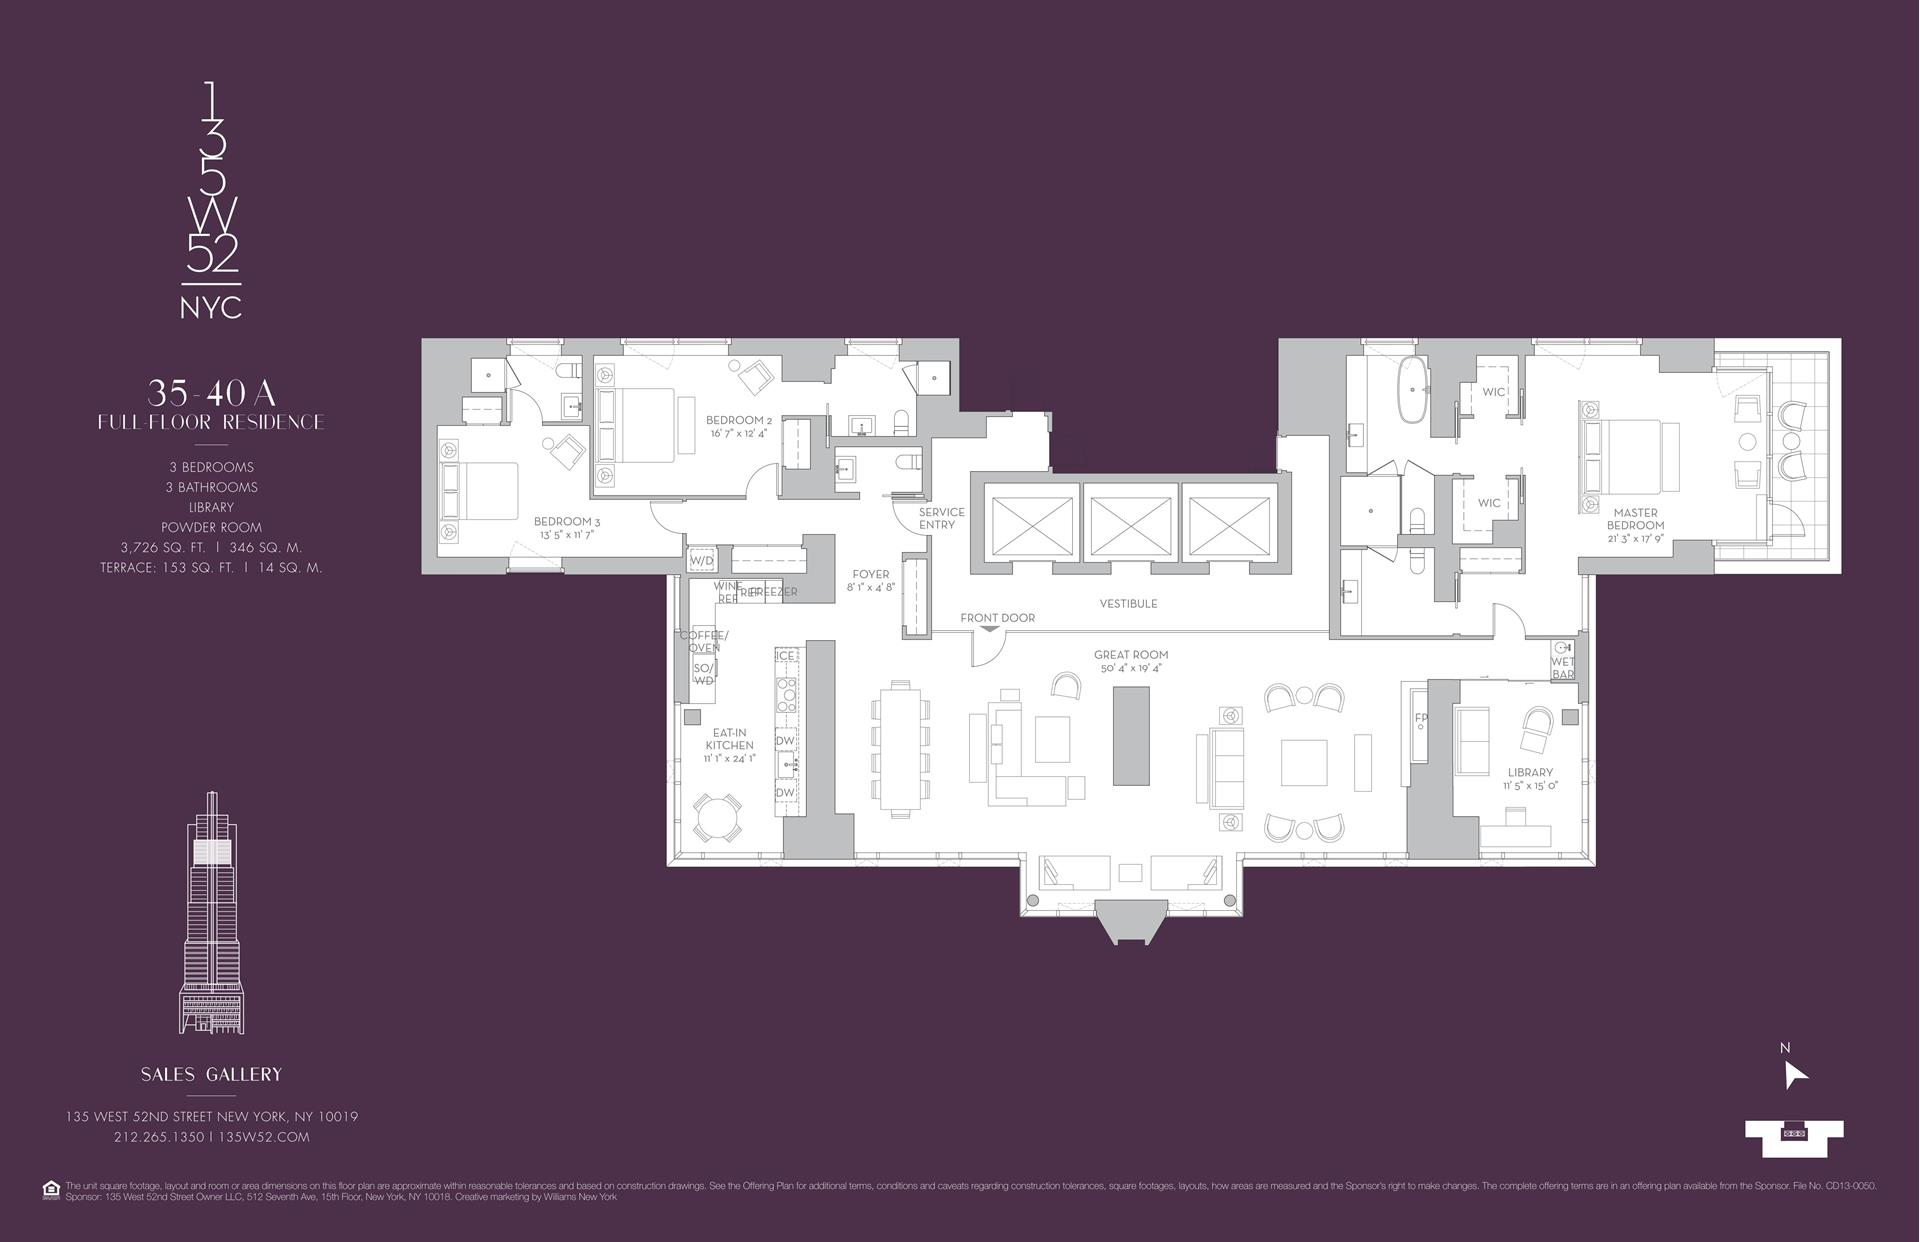 Floor plan of 135 West 52nd Street, 37A - Midtown, New York